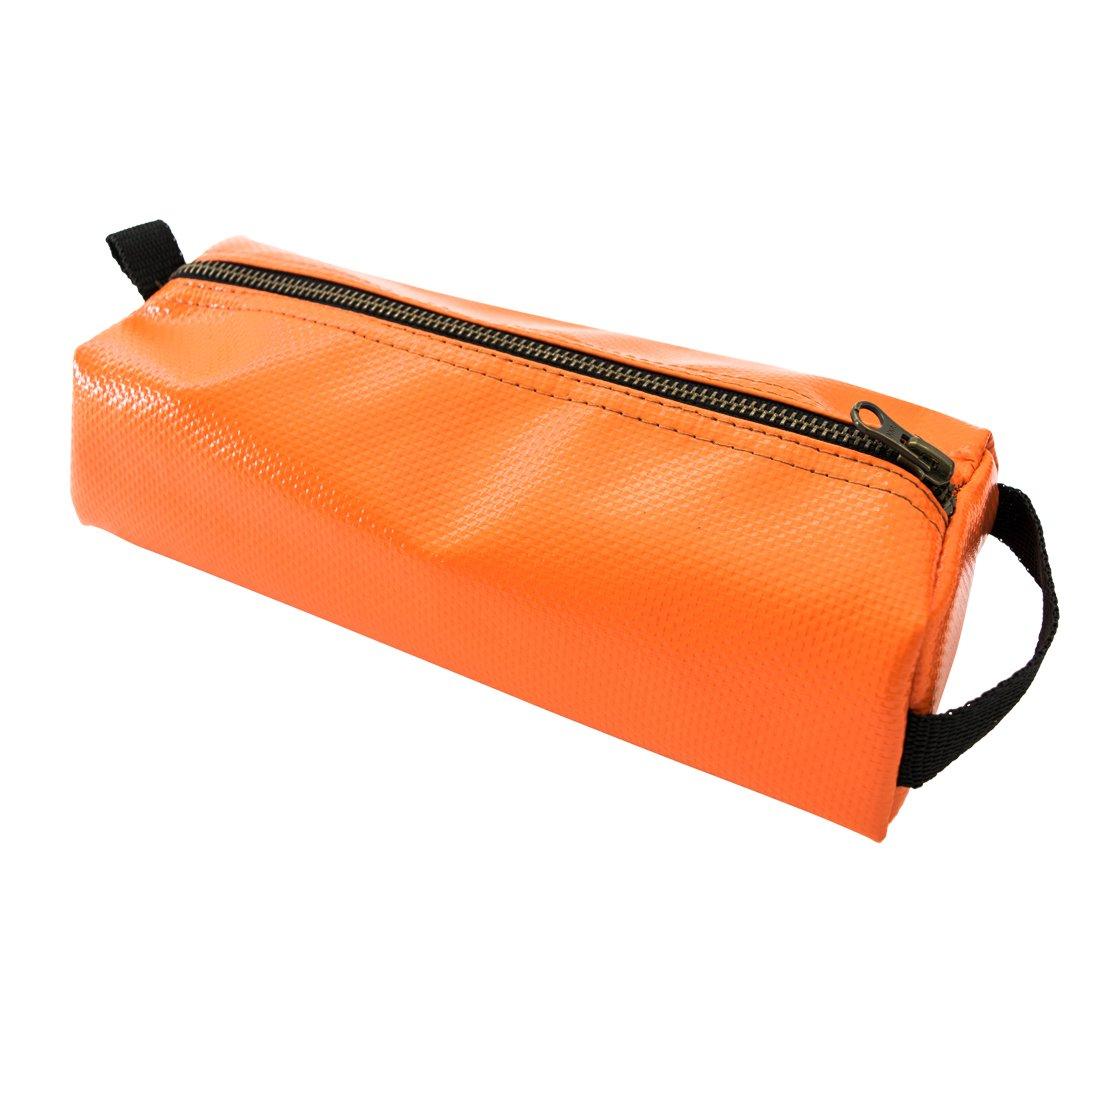 Vinyl Canvas Tool Pencil Case Pouch Handmade by Hide & Drink :: Orange   B01J4533EG